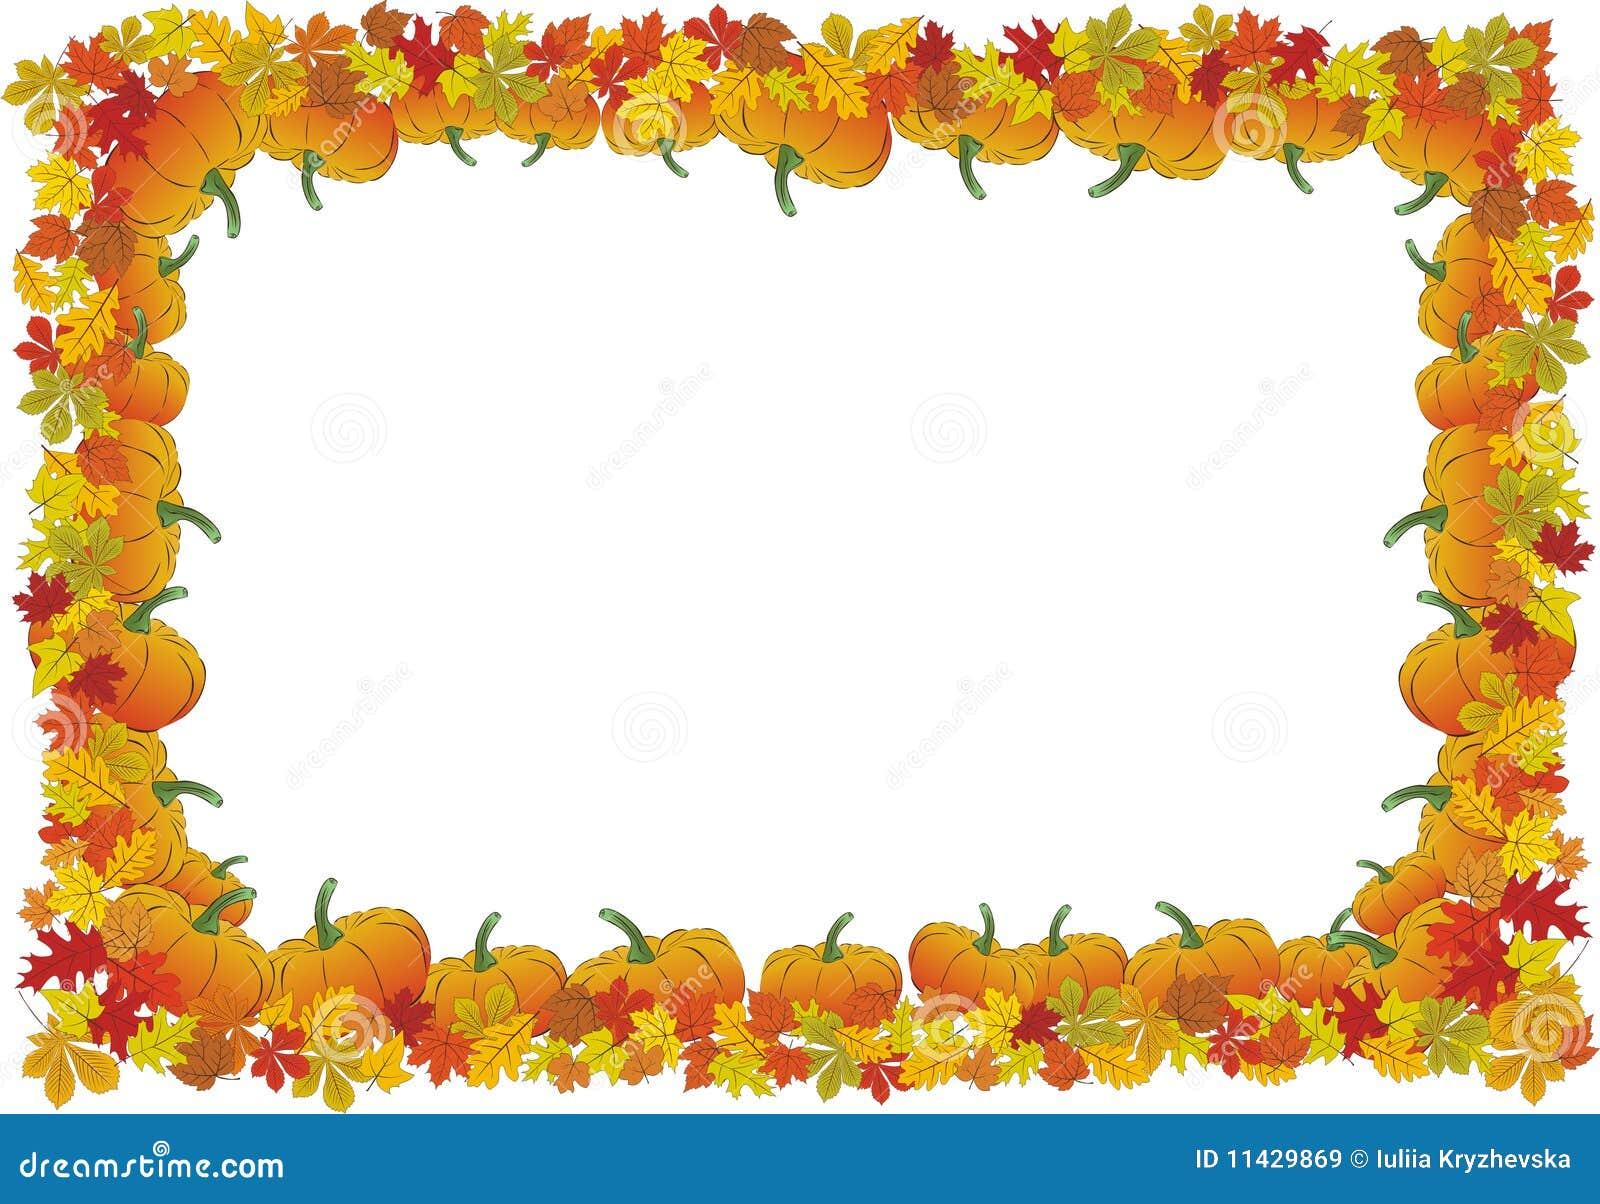 thanksgiving day autumnal vector frame stock vector illustration